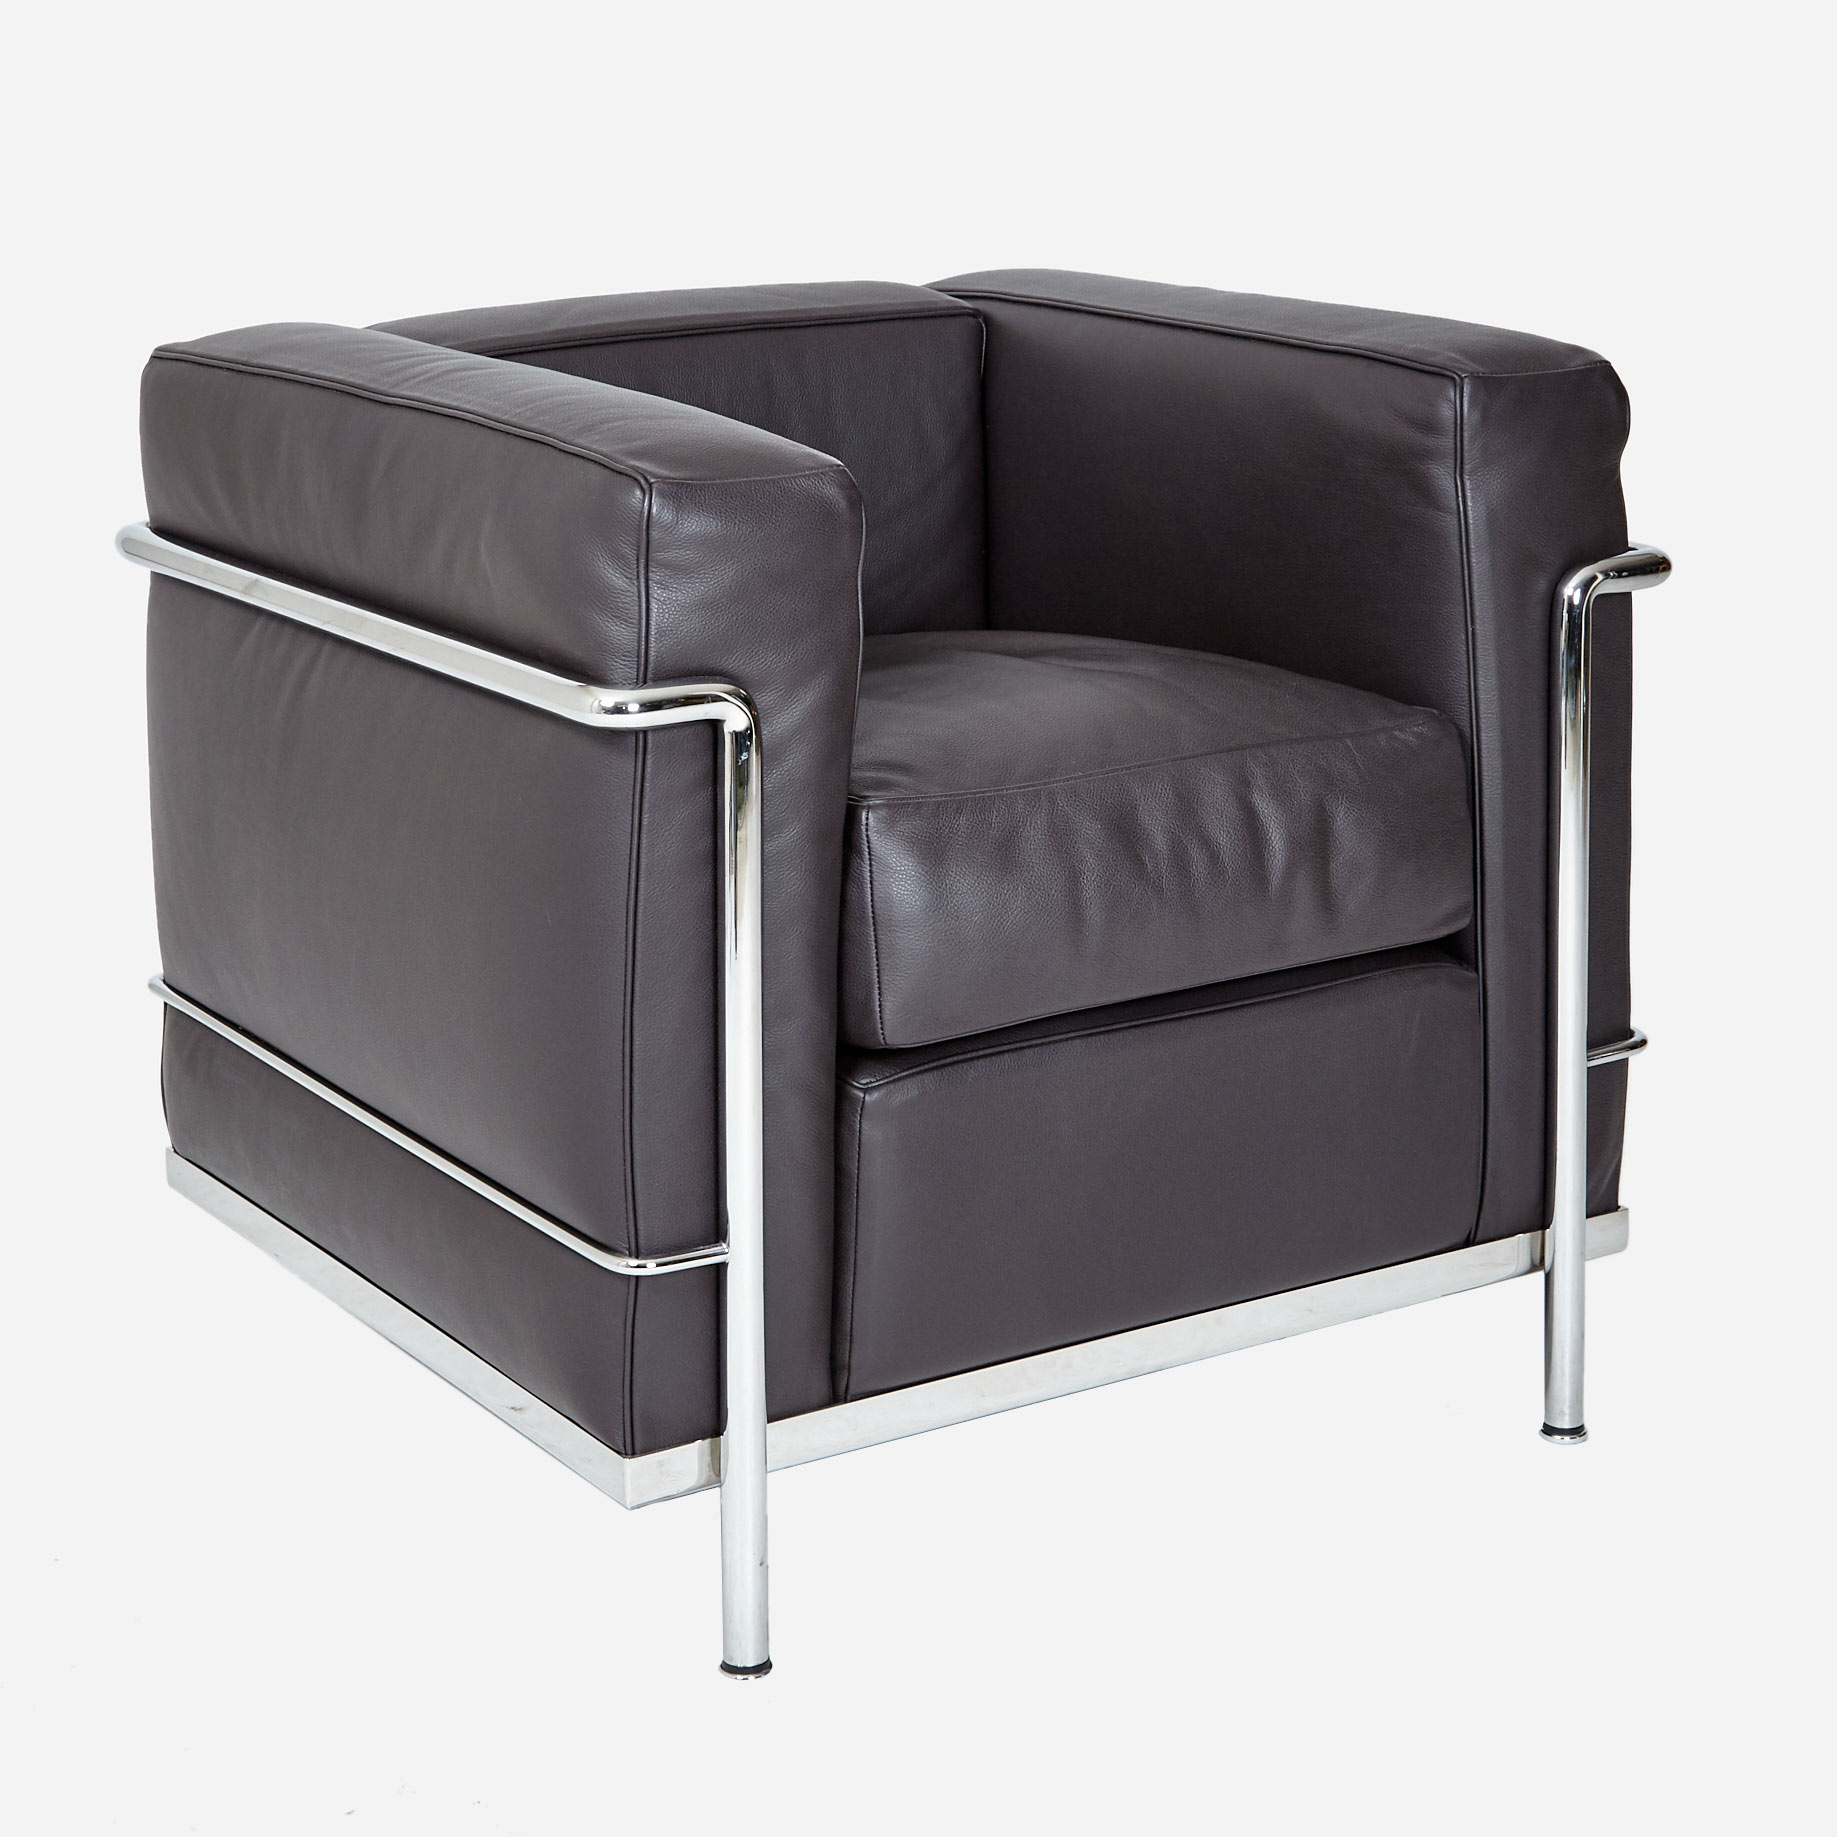 Le Corbusier Sessel LC2 von Cassina Neuwertig 2016